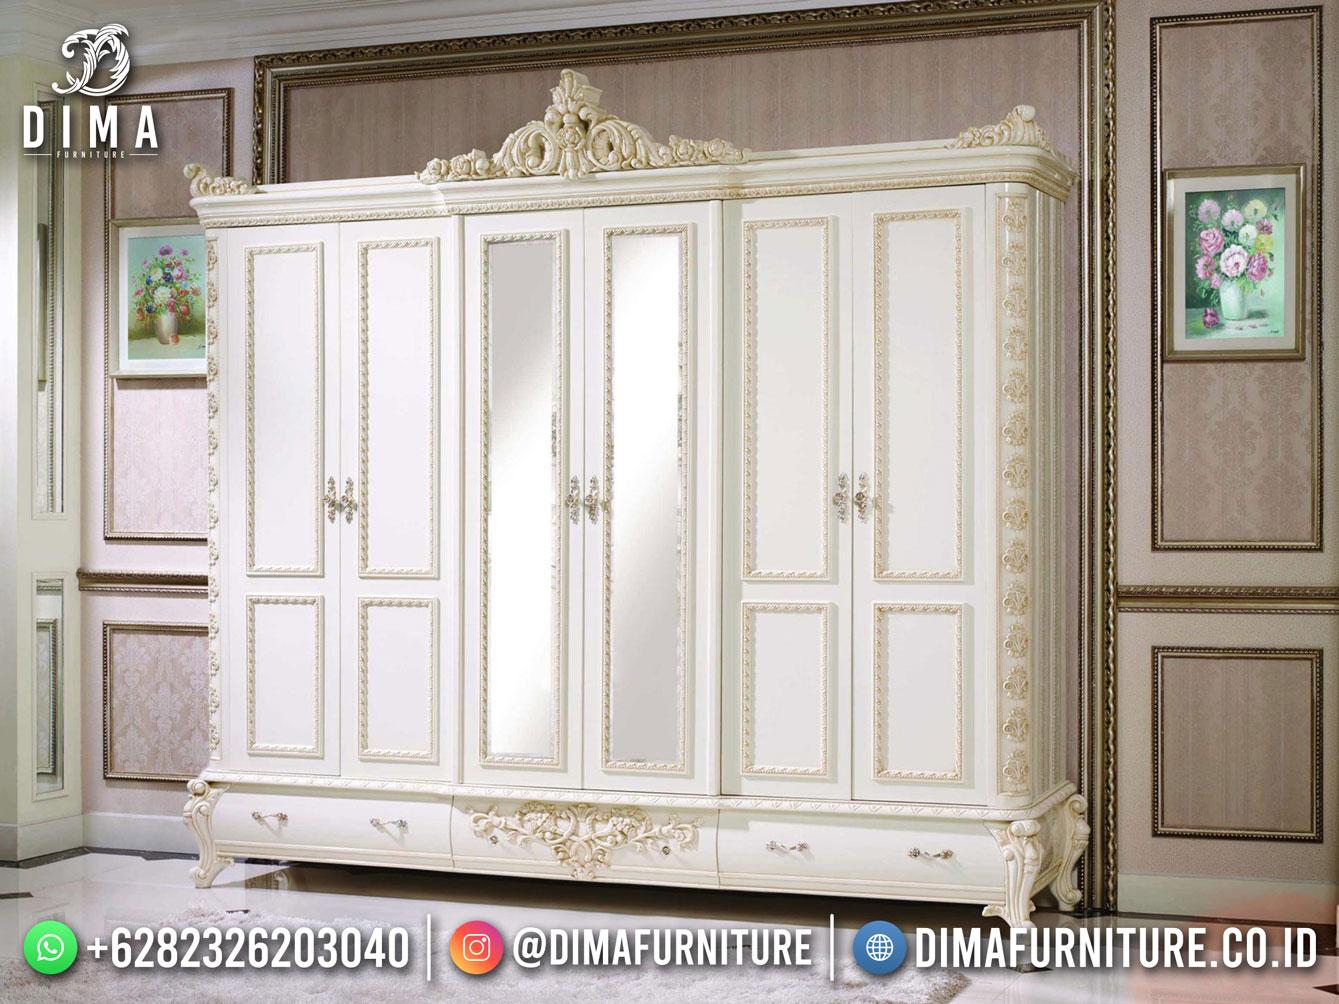 Lemari Pakaian Terbaru Alexandra Luxury Carving Best Price DF-1718